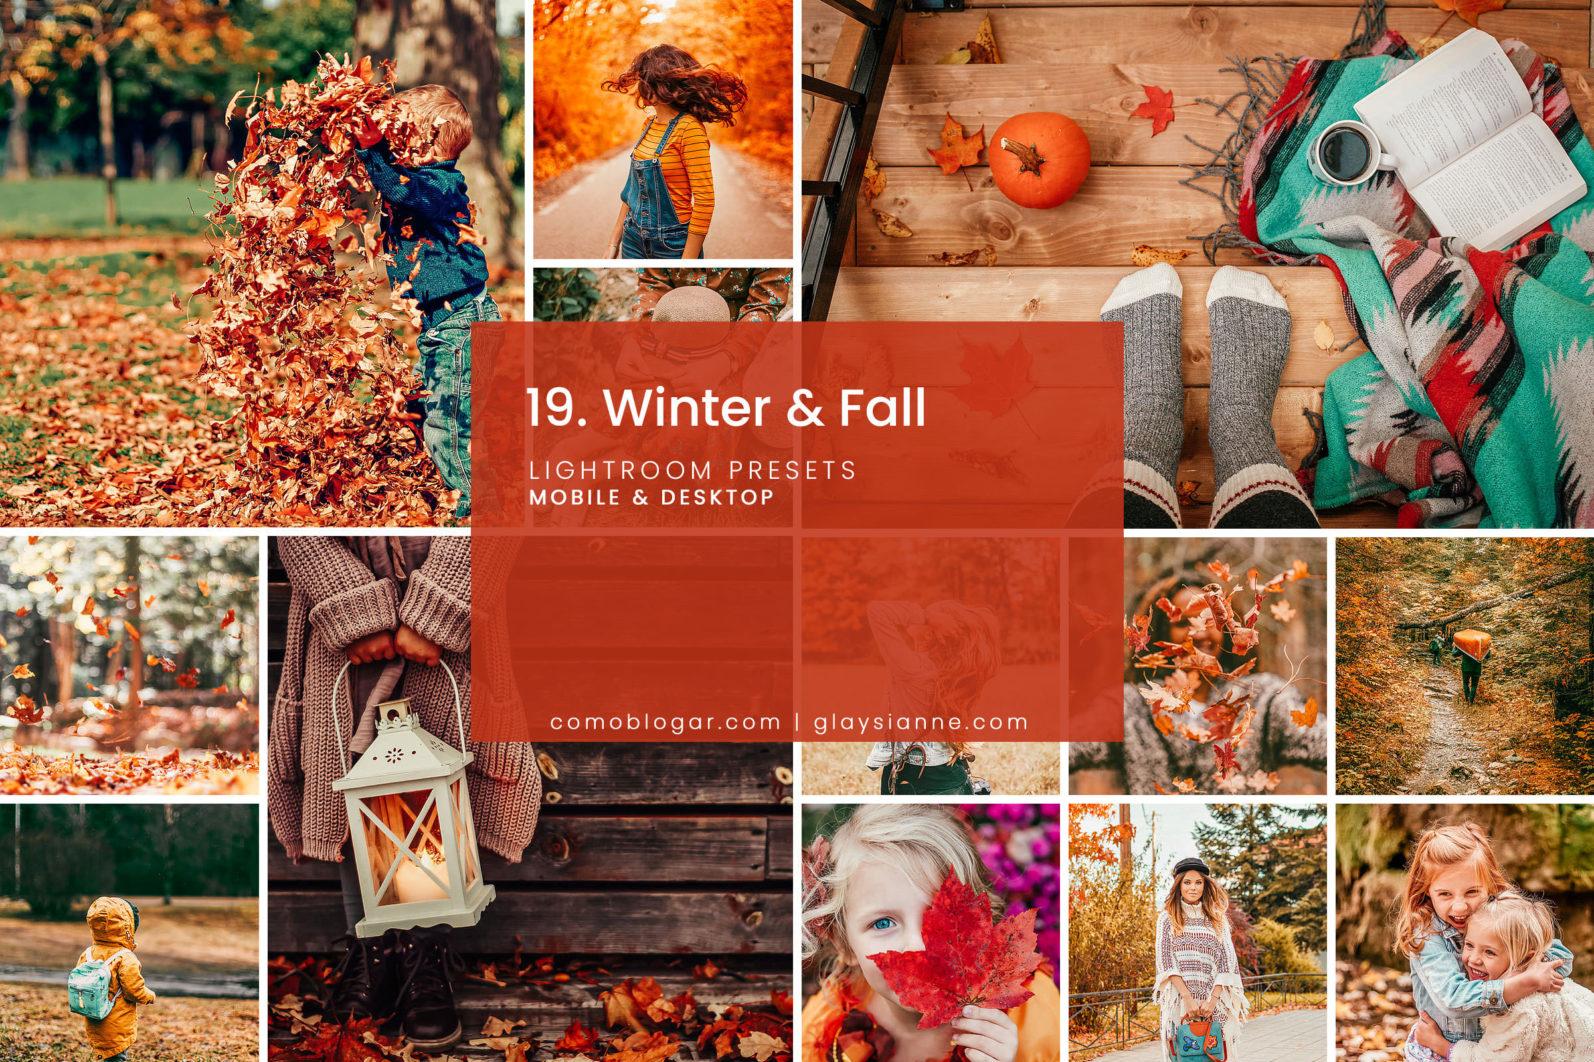 19. Winter & Fall - 19.WINTERFALL 01 -